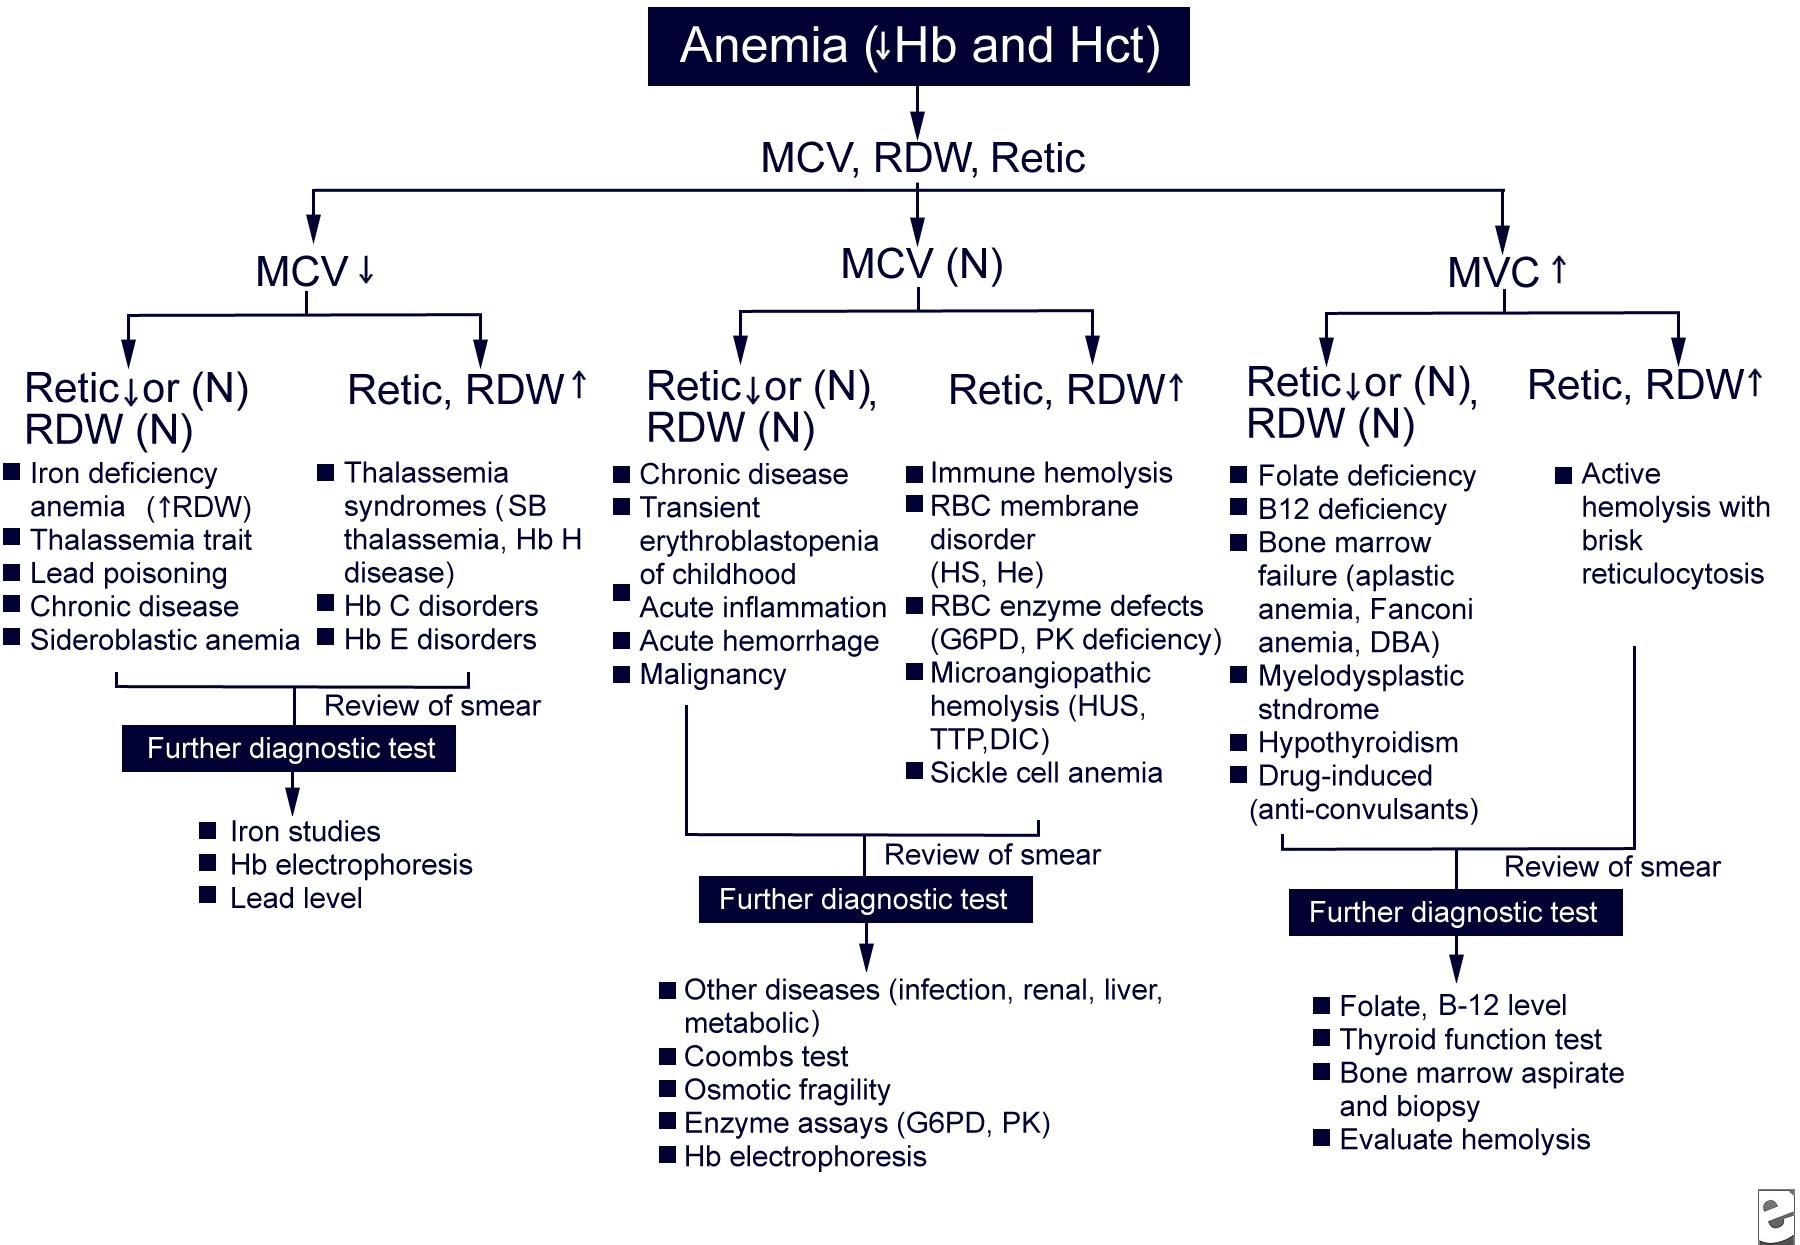 anemia workup